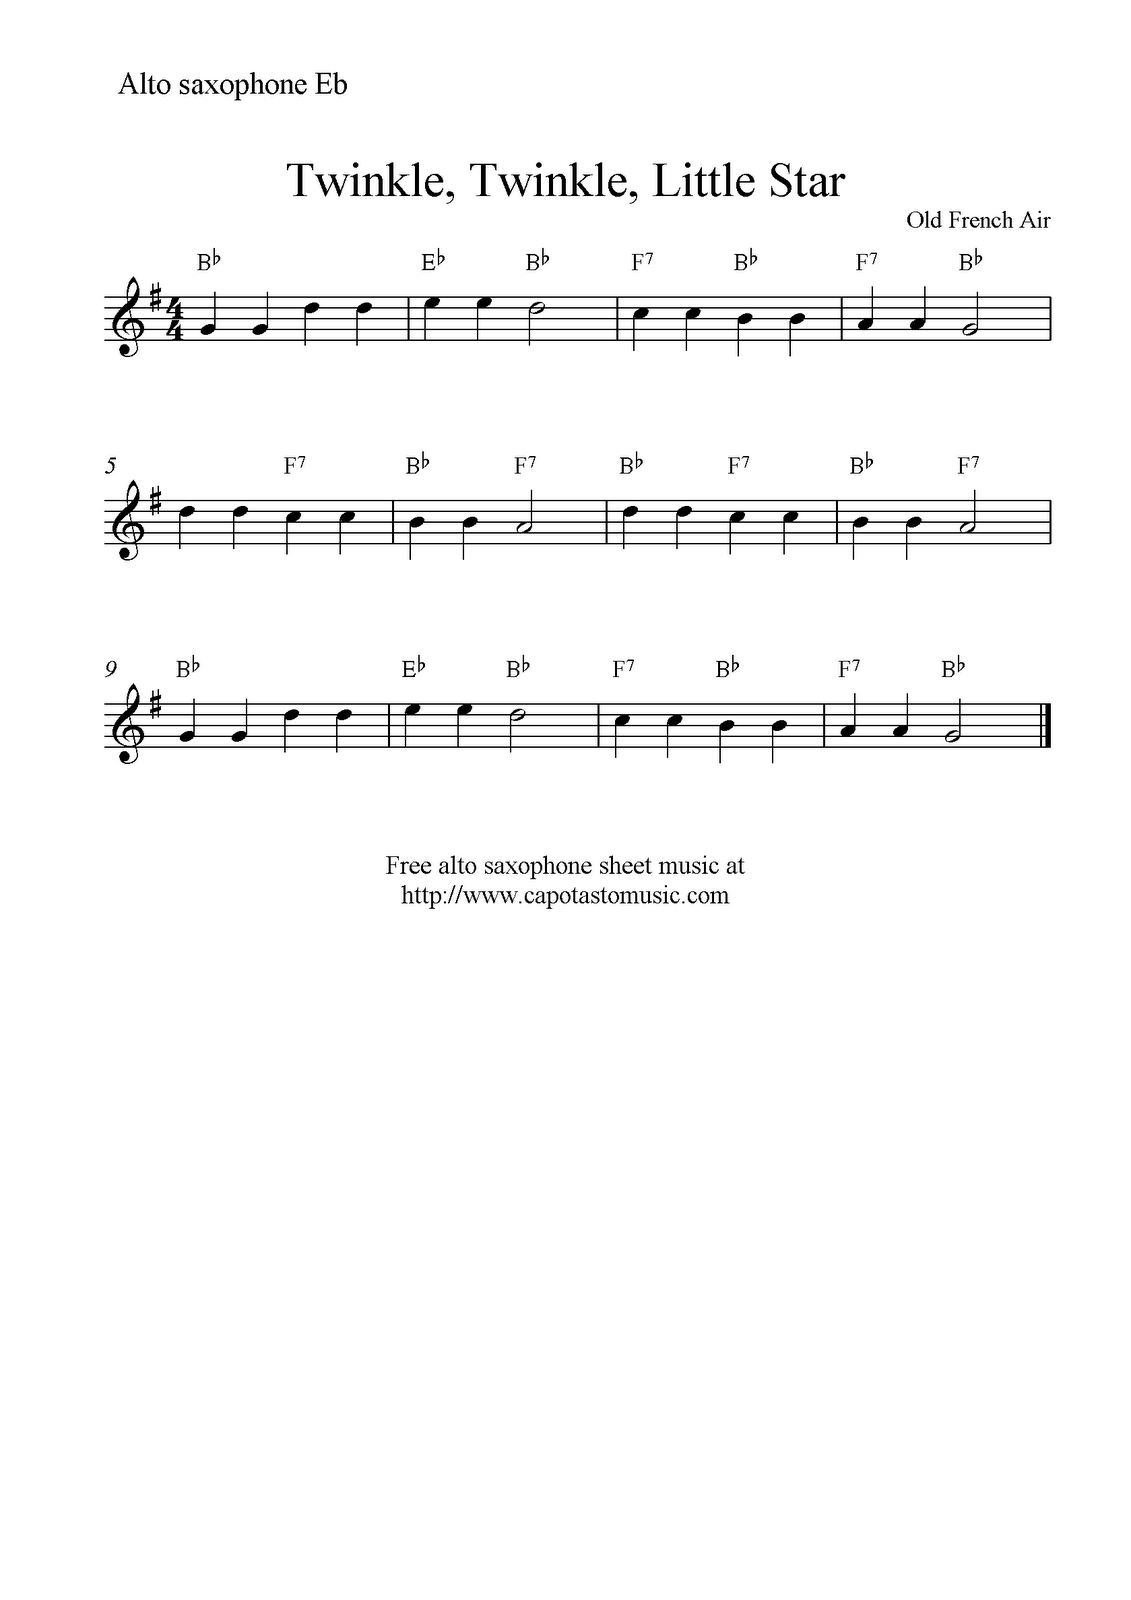 Free Sheet Music Scores: Twinkle, Twinkle, Little Star, Free Alto - Free Printable Alto Saxophone Sheet Music